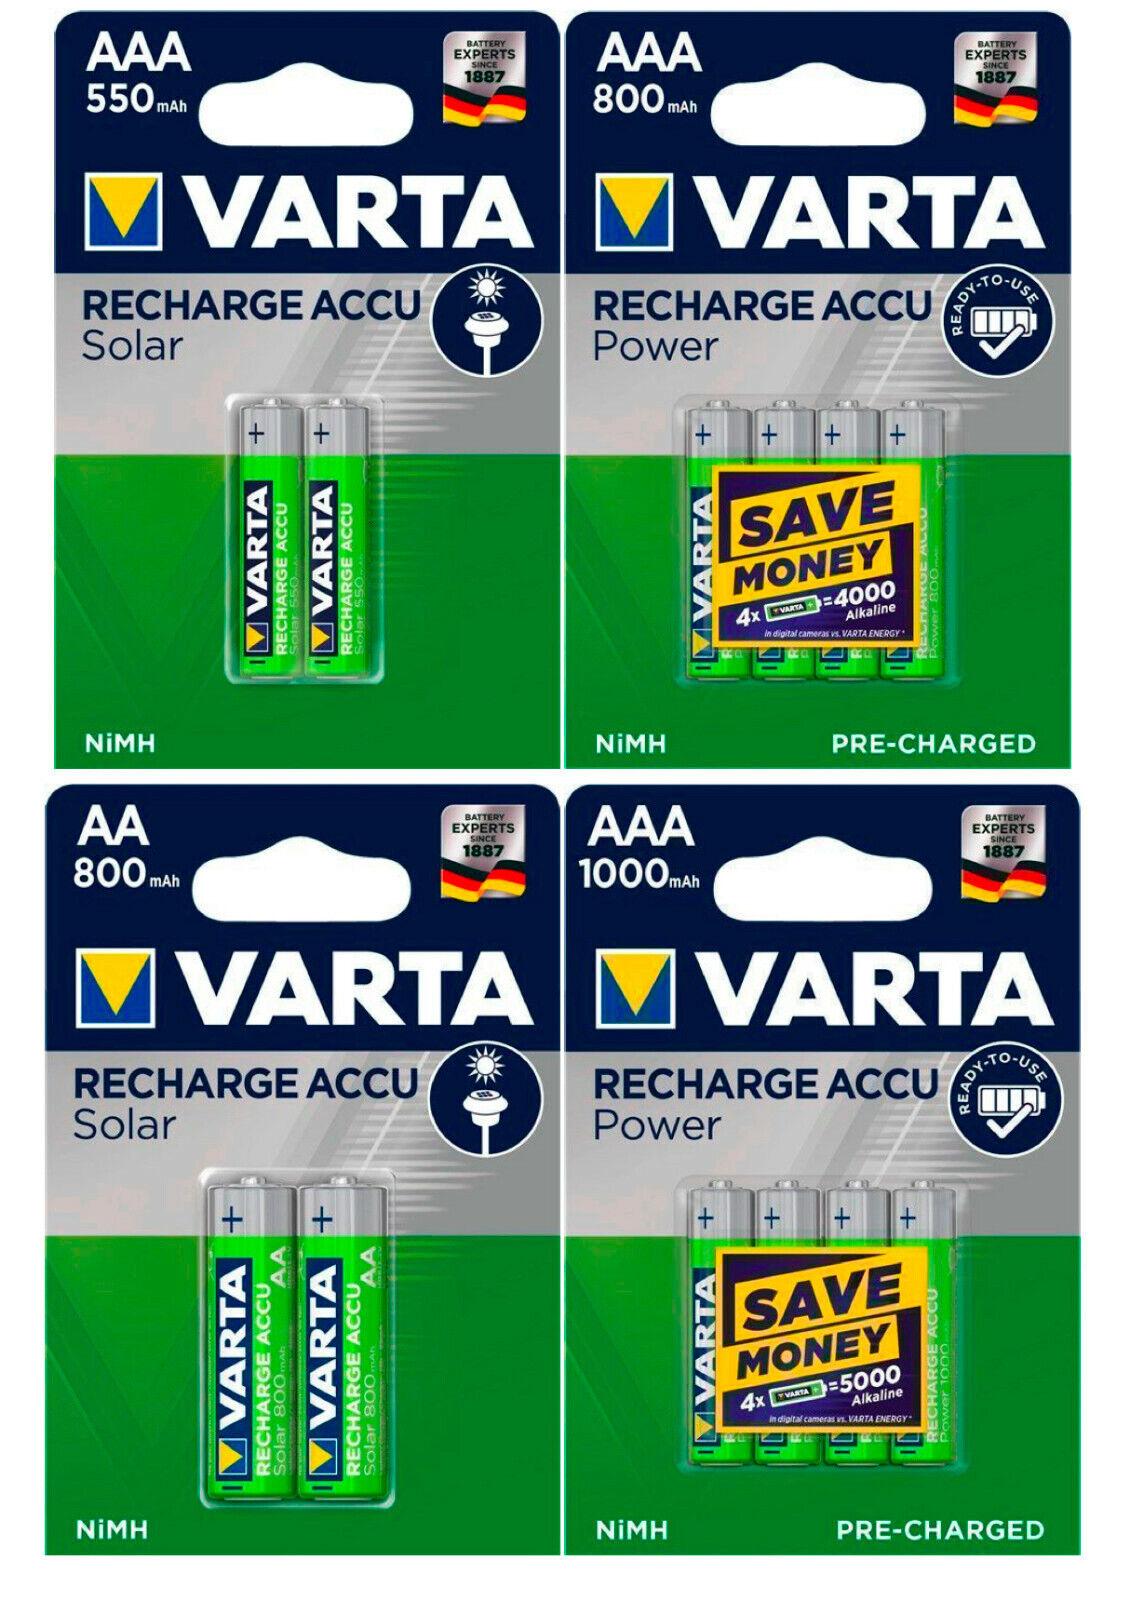 Varta Power Akkus AAA AA Micro Mignon 550mAh 800mAh 1000mAh für u.a. Telefon  | Speichern